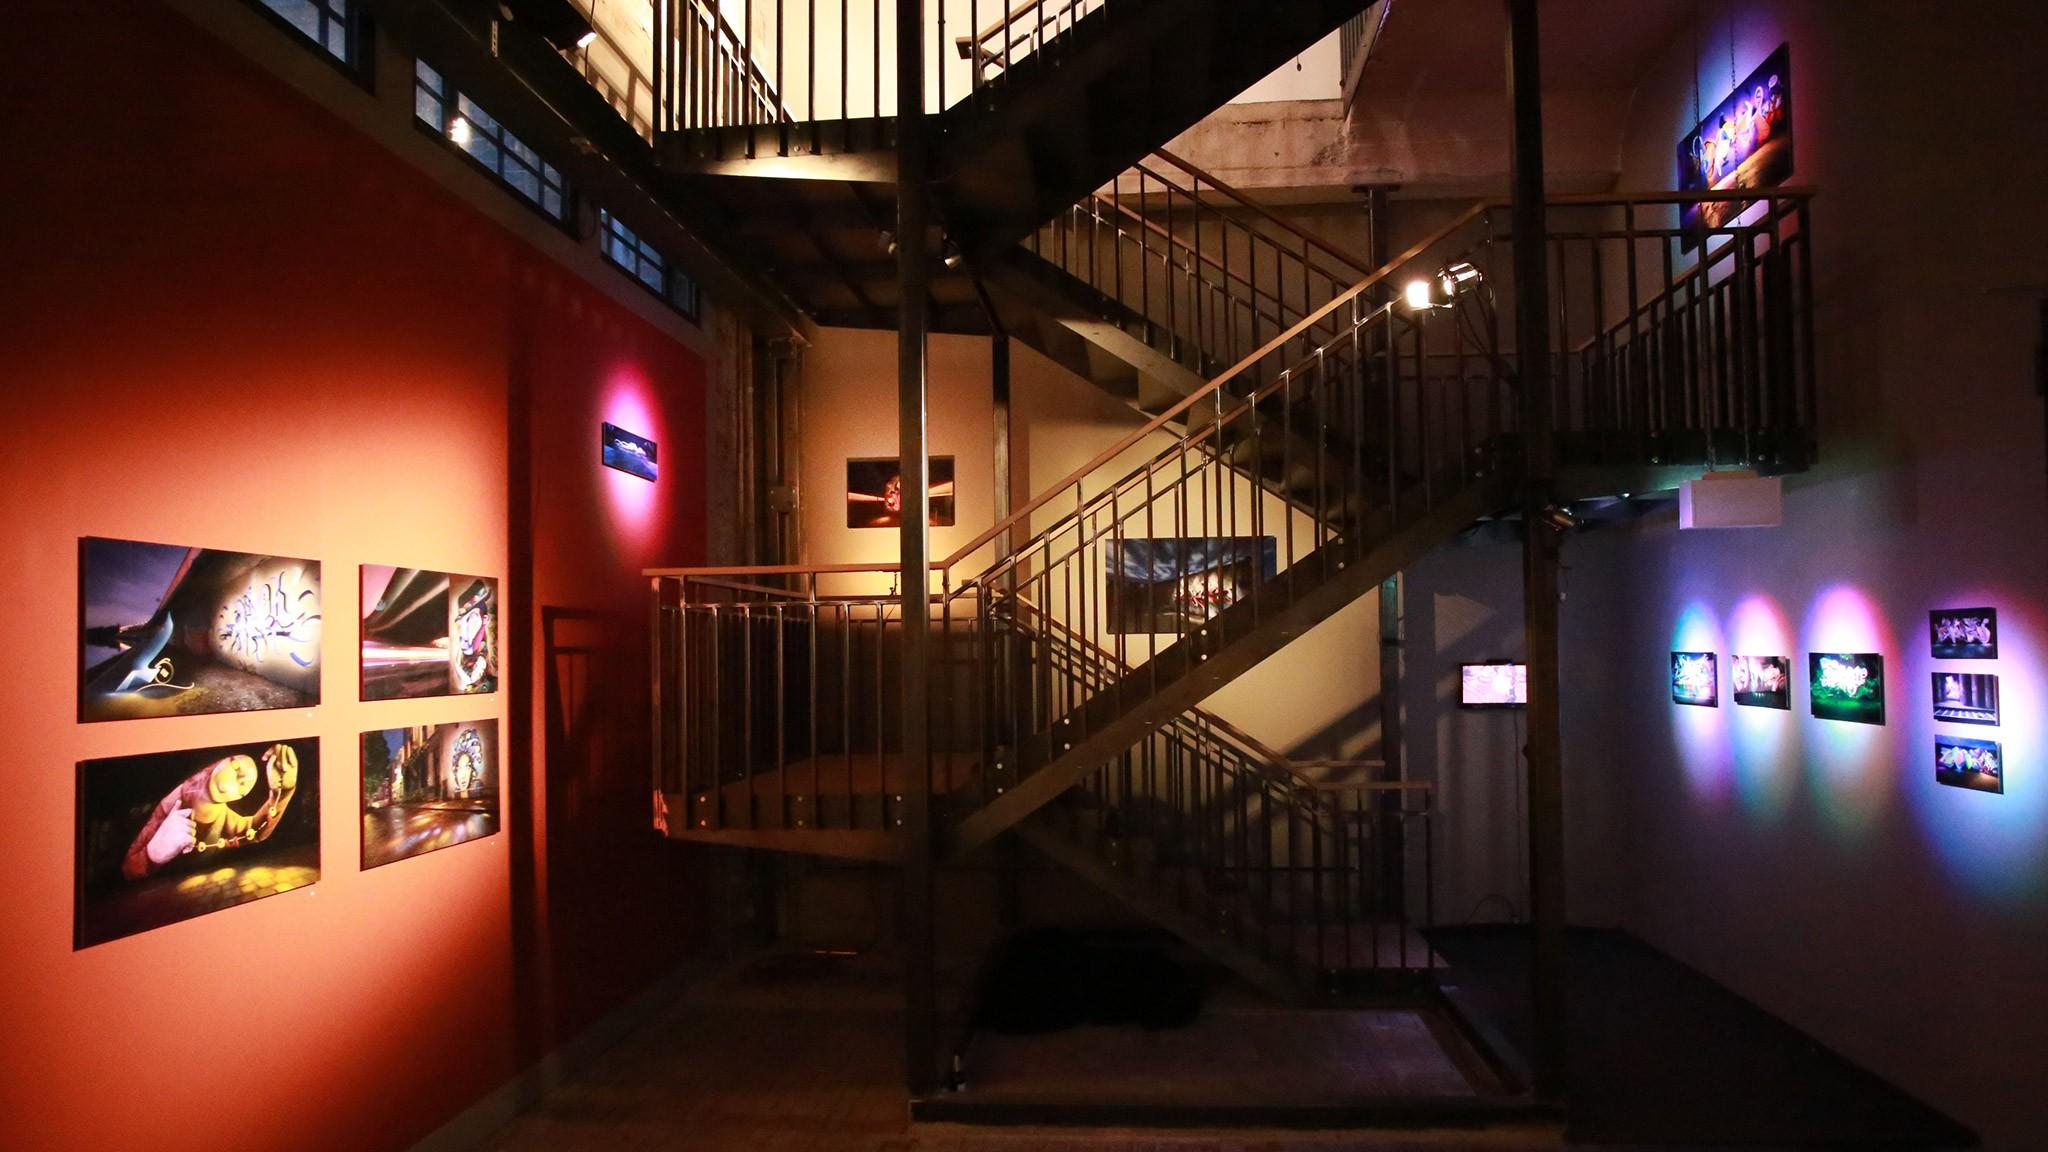 Luminale solo expo, Frankfort 2016